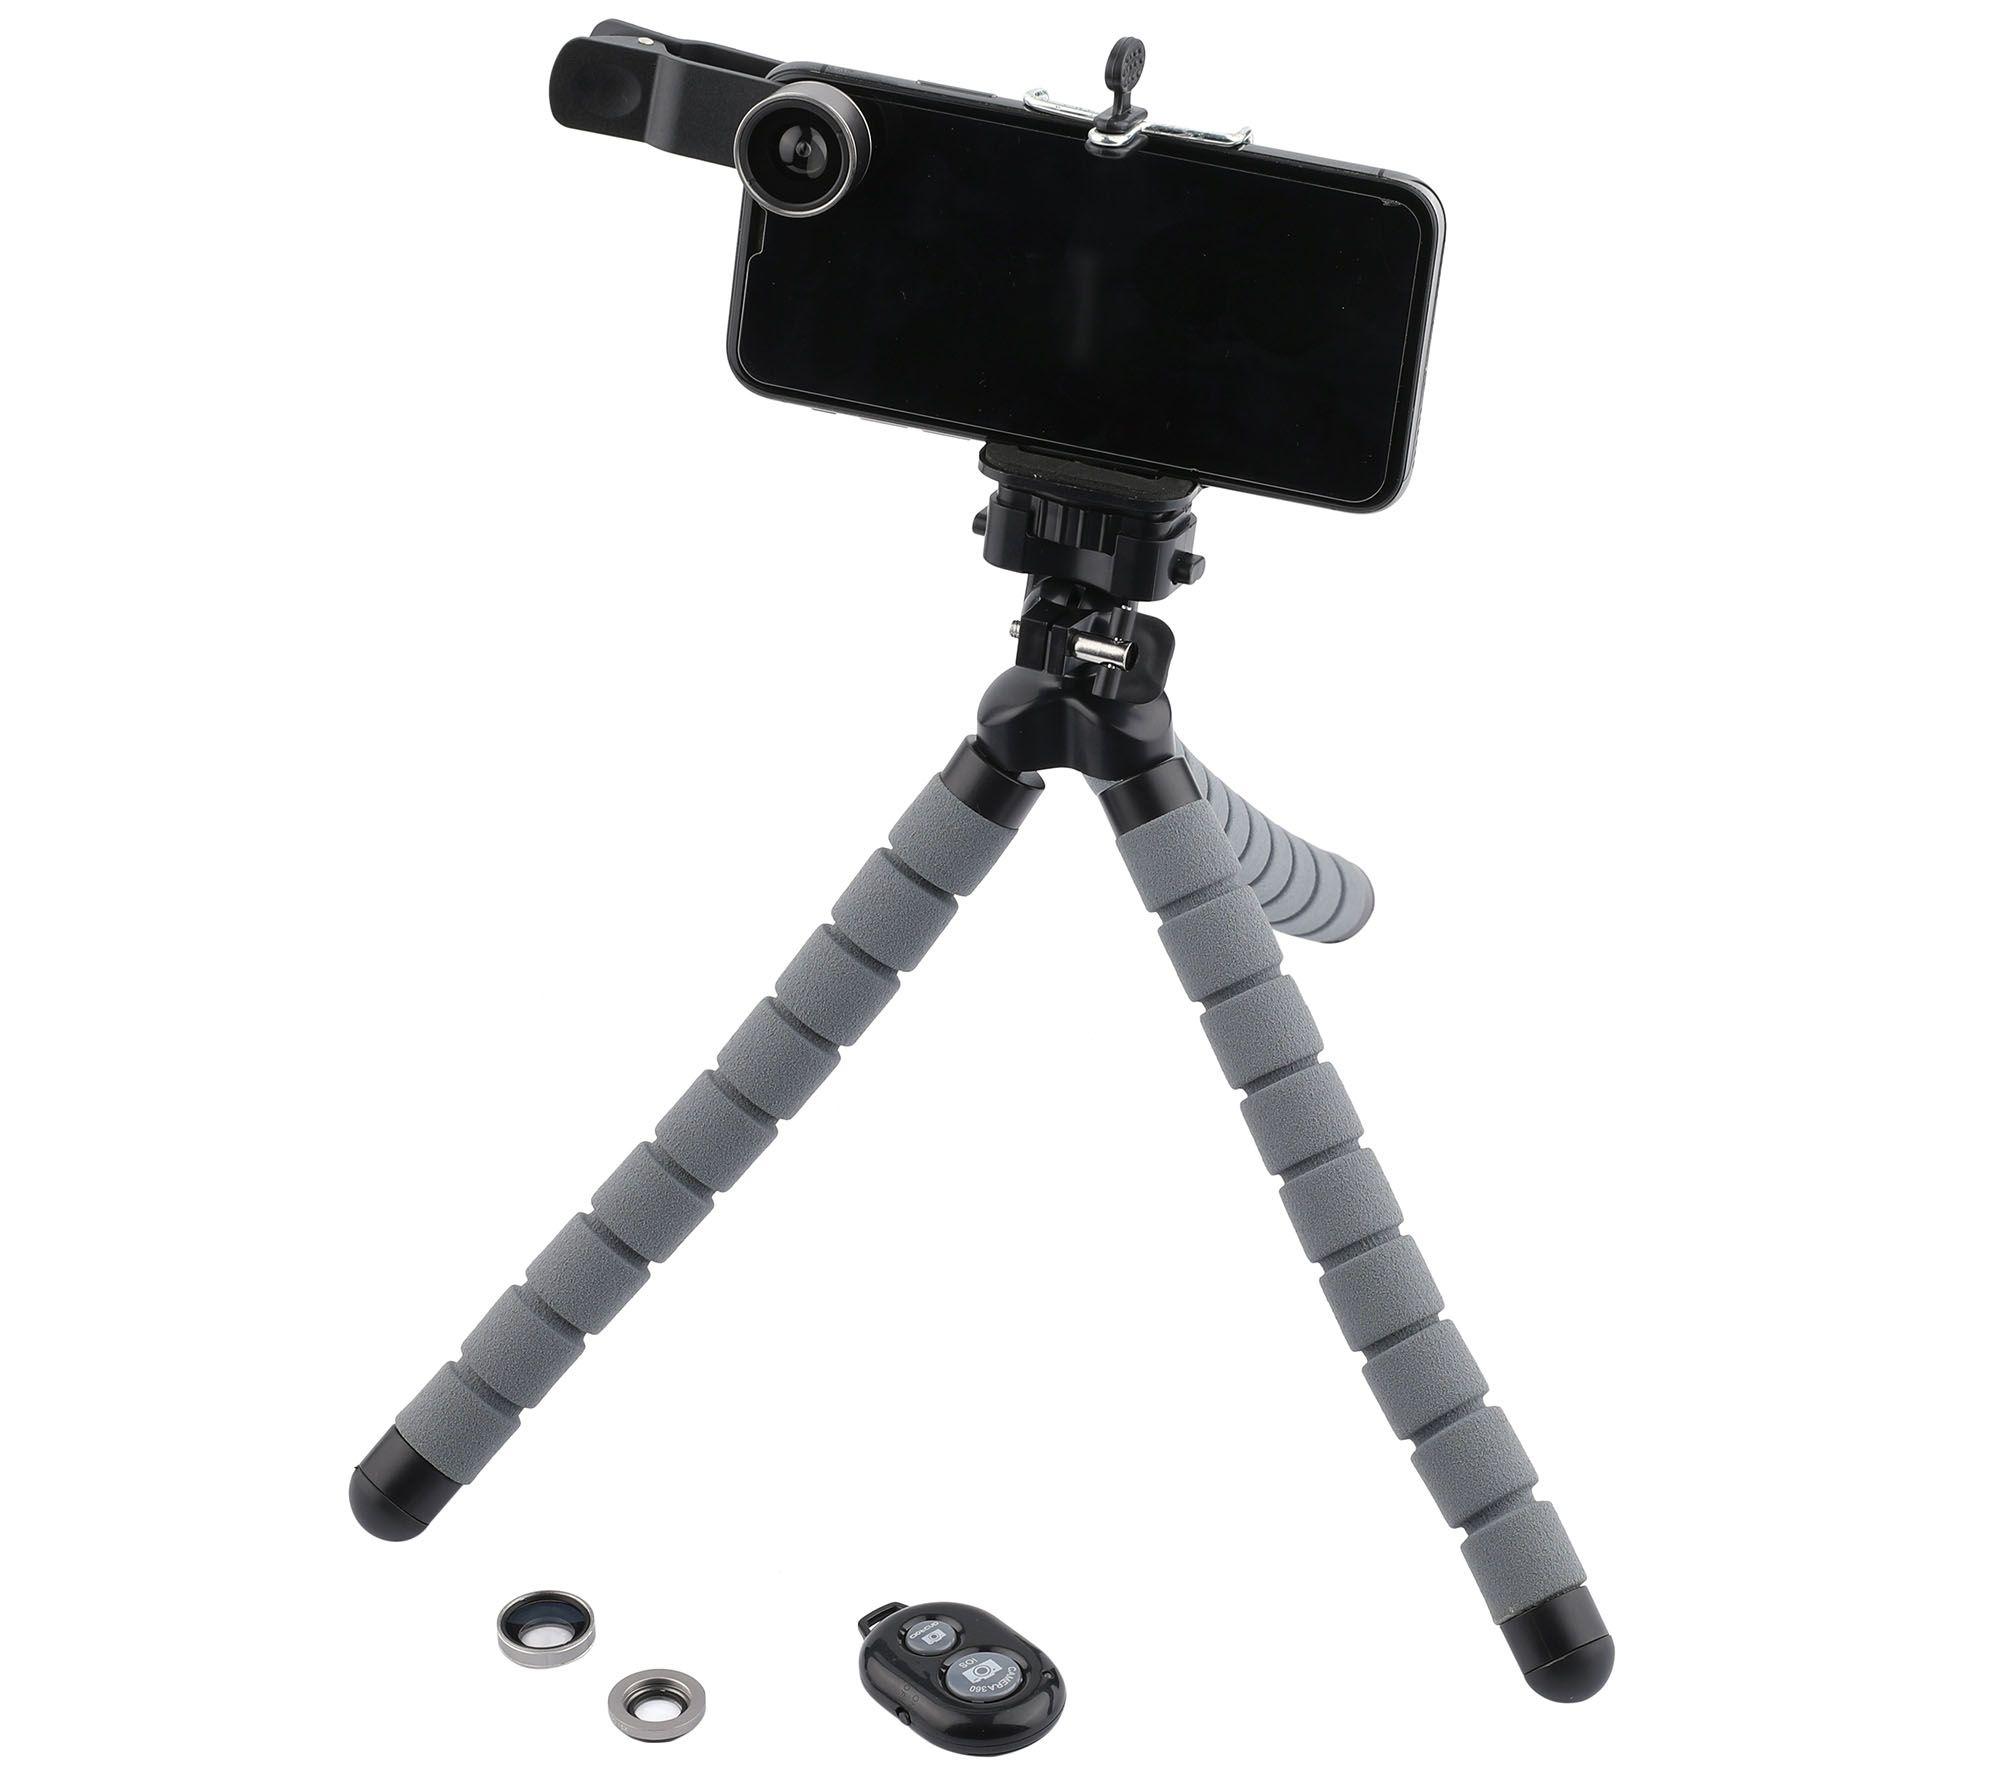 Poser Snap Pro 6 Piece Mobile Photo Video Studio Kit With Tripod